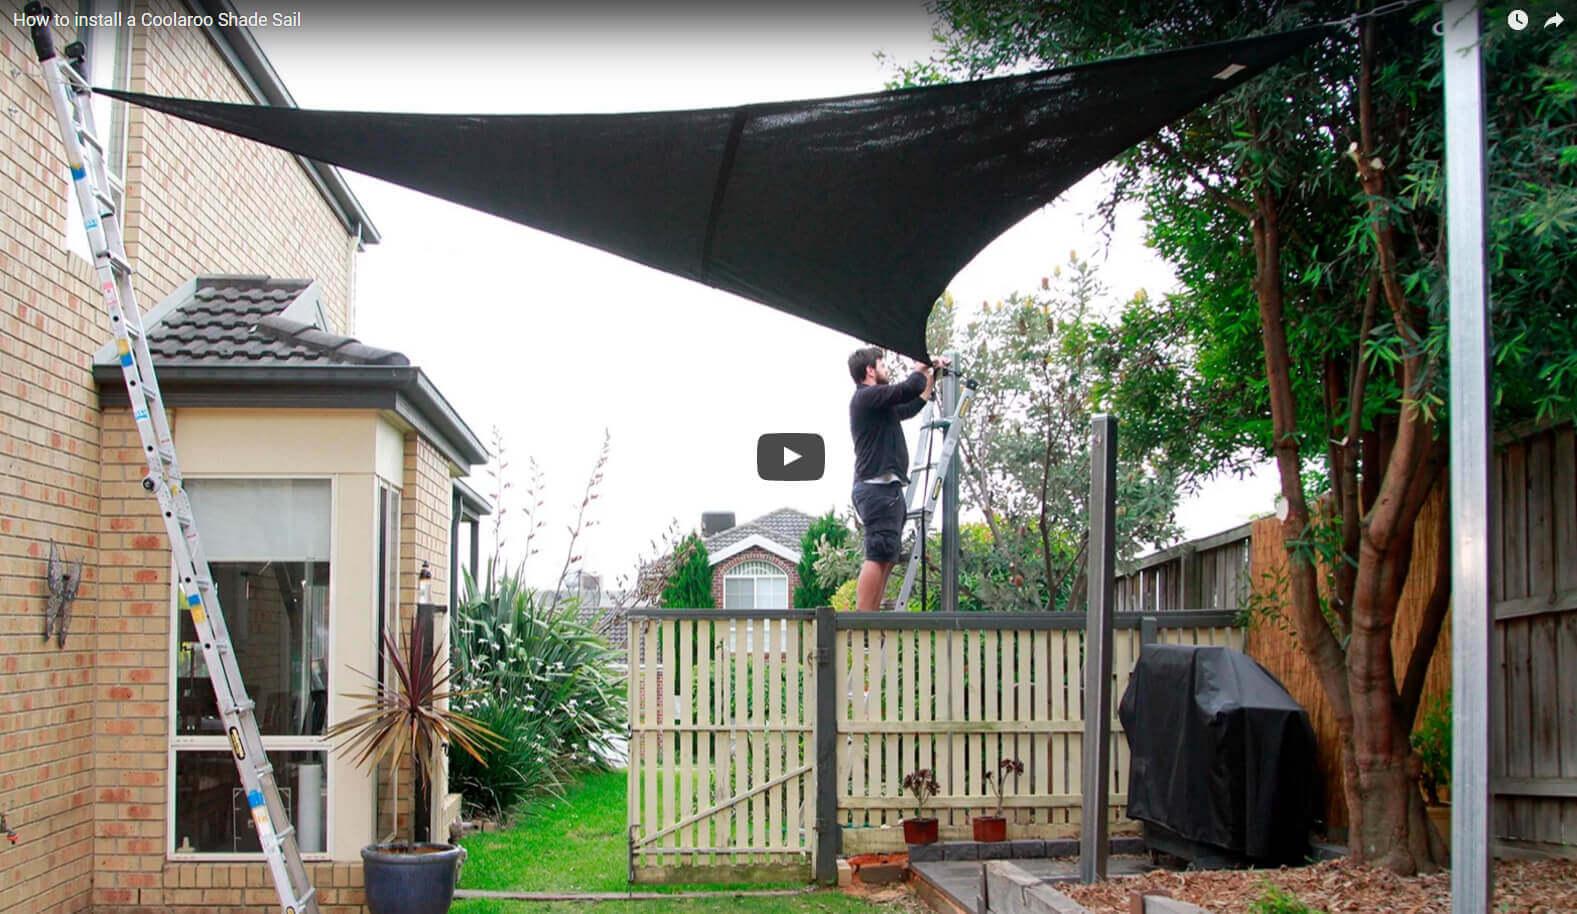 How to install a Coolaroo Shade Sail